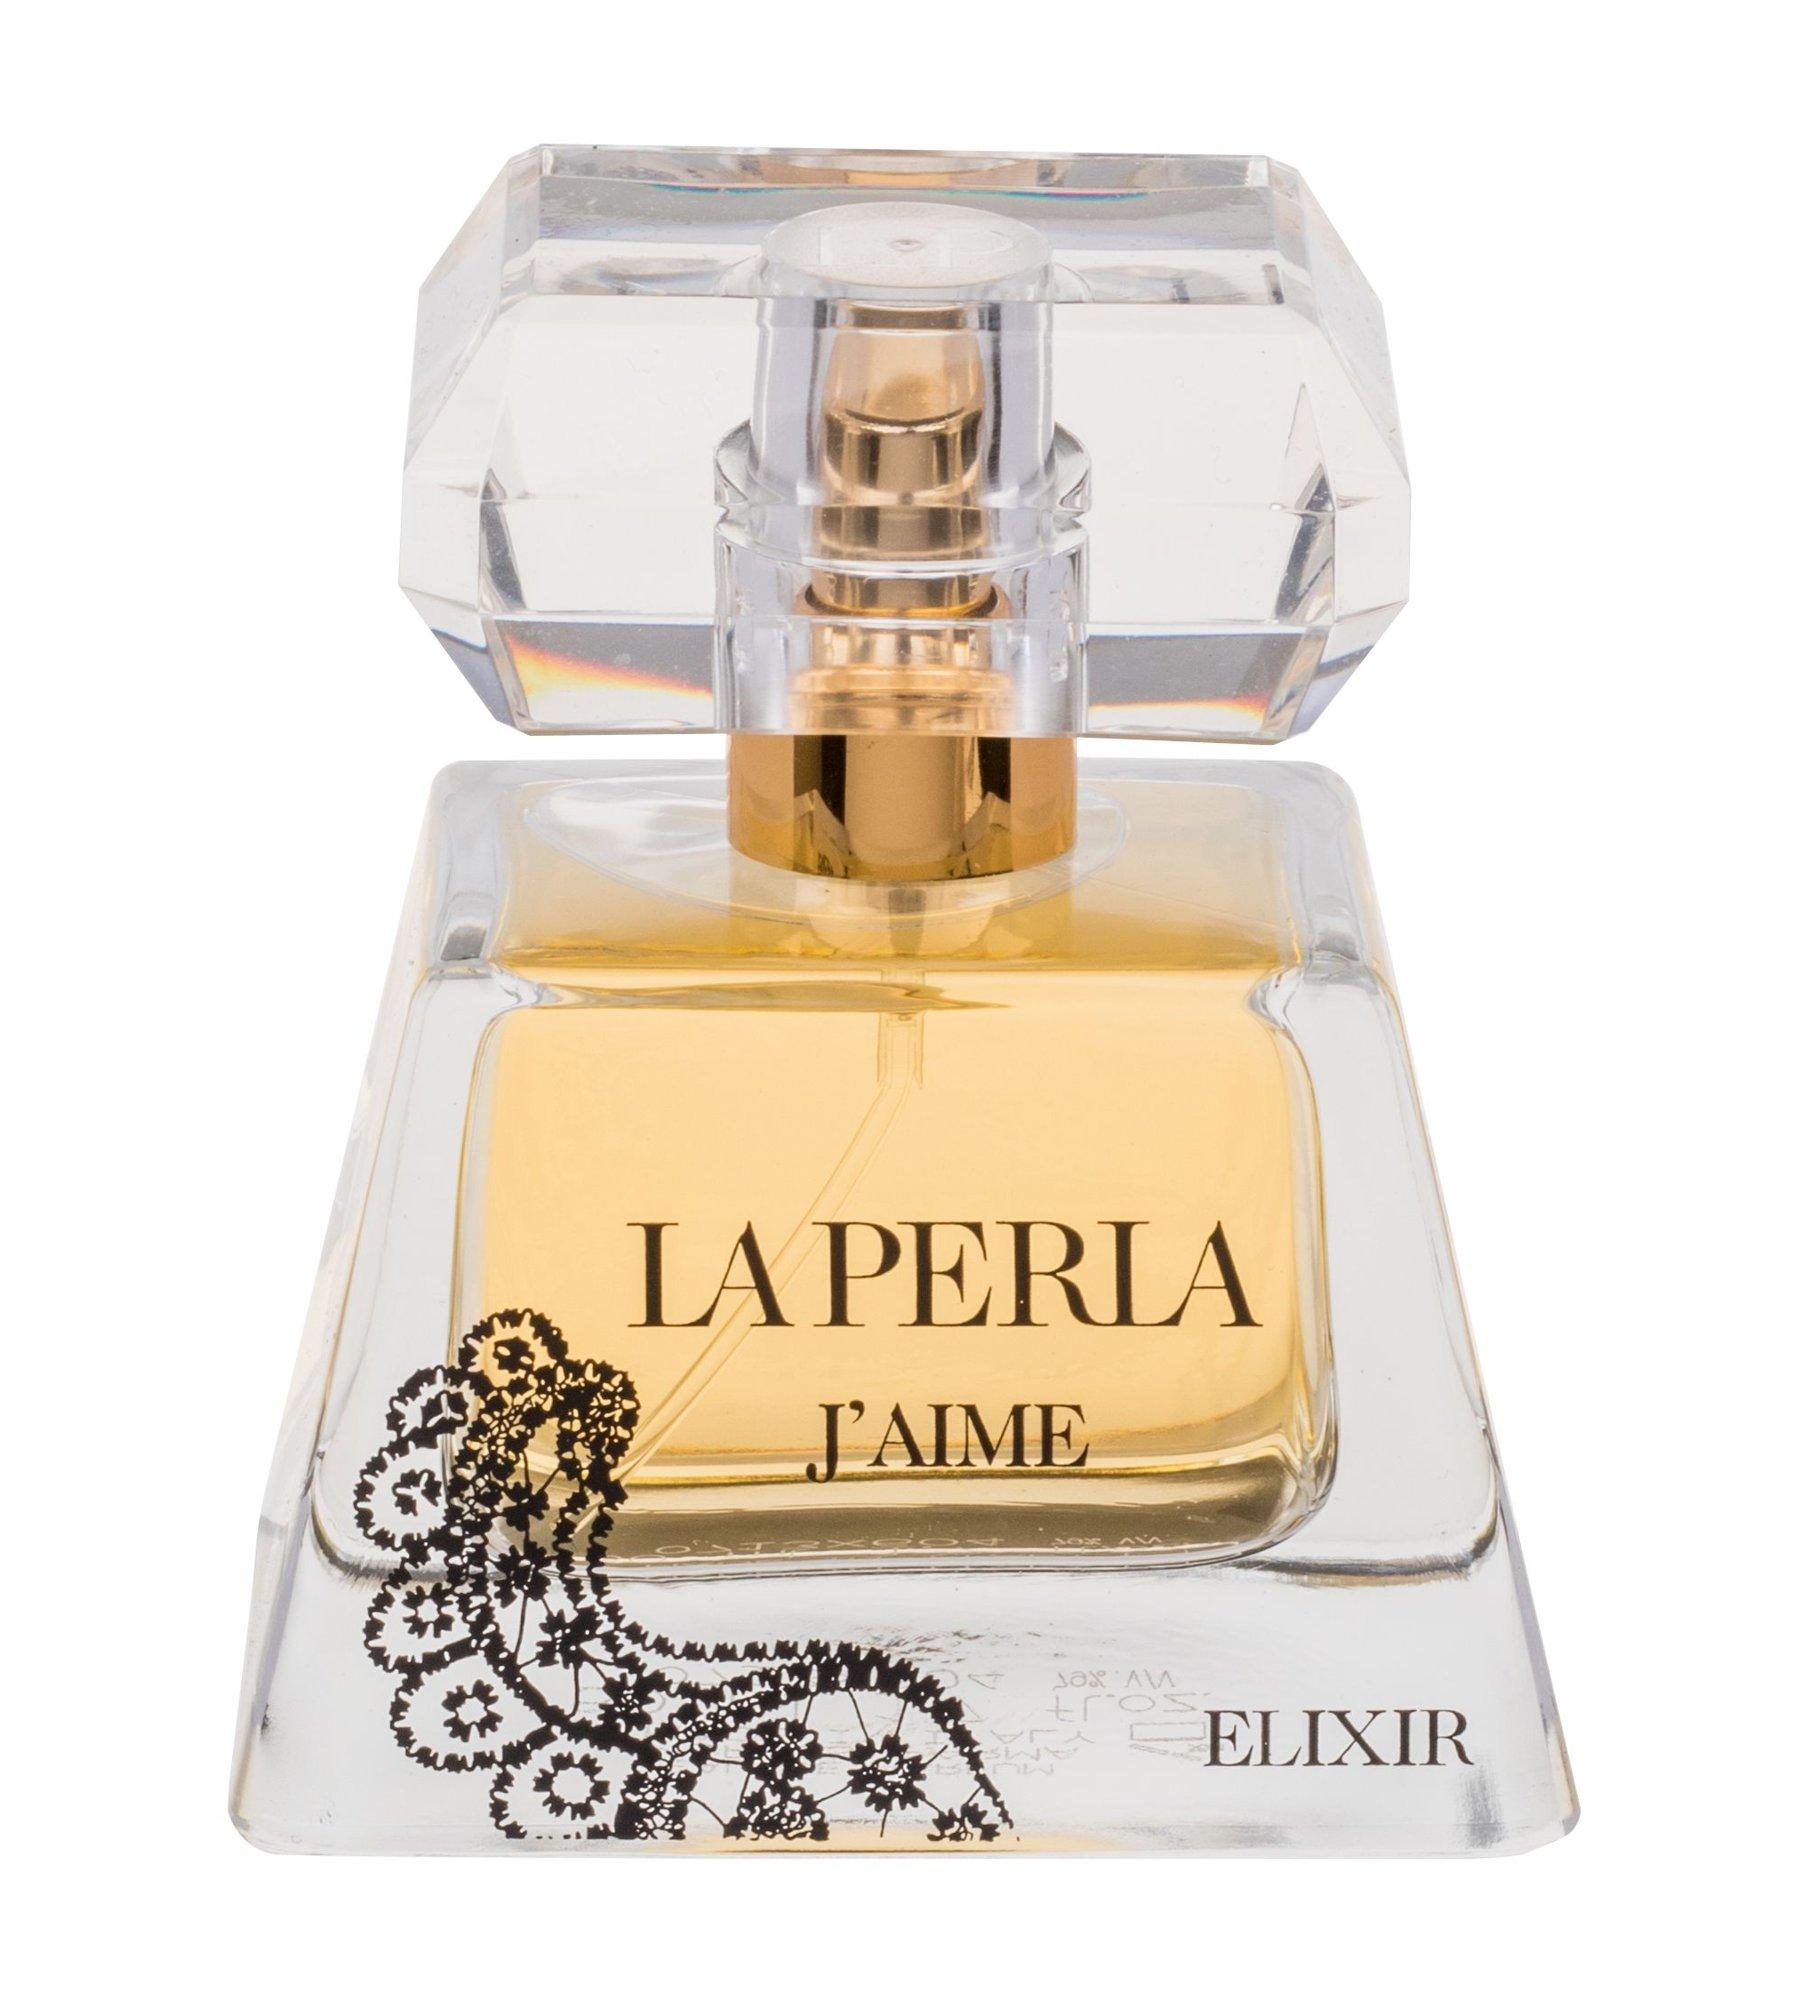 La Perla J´Aime EDP 50ml  Elixir